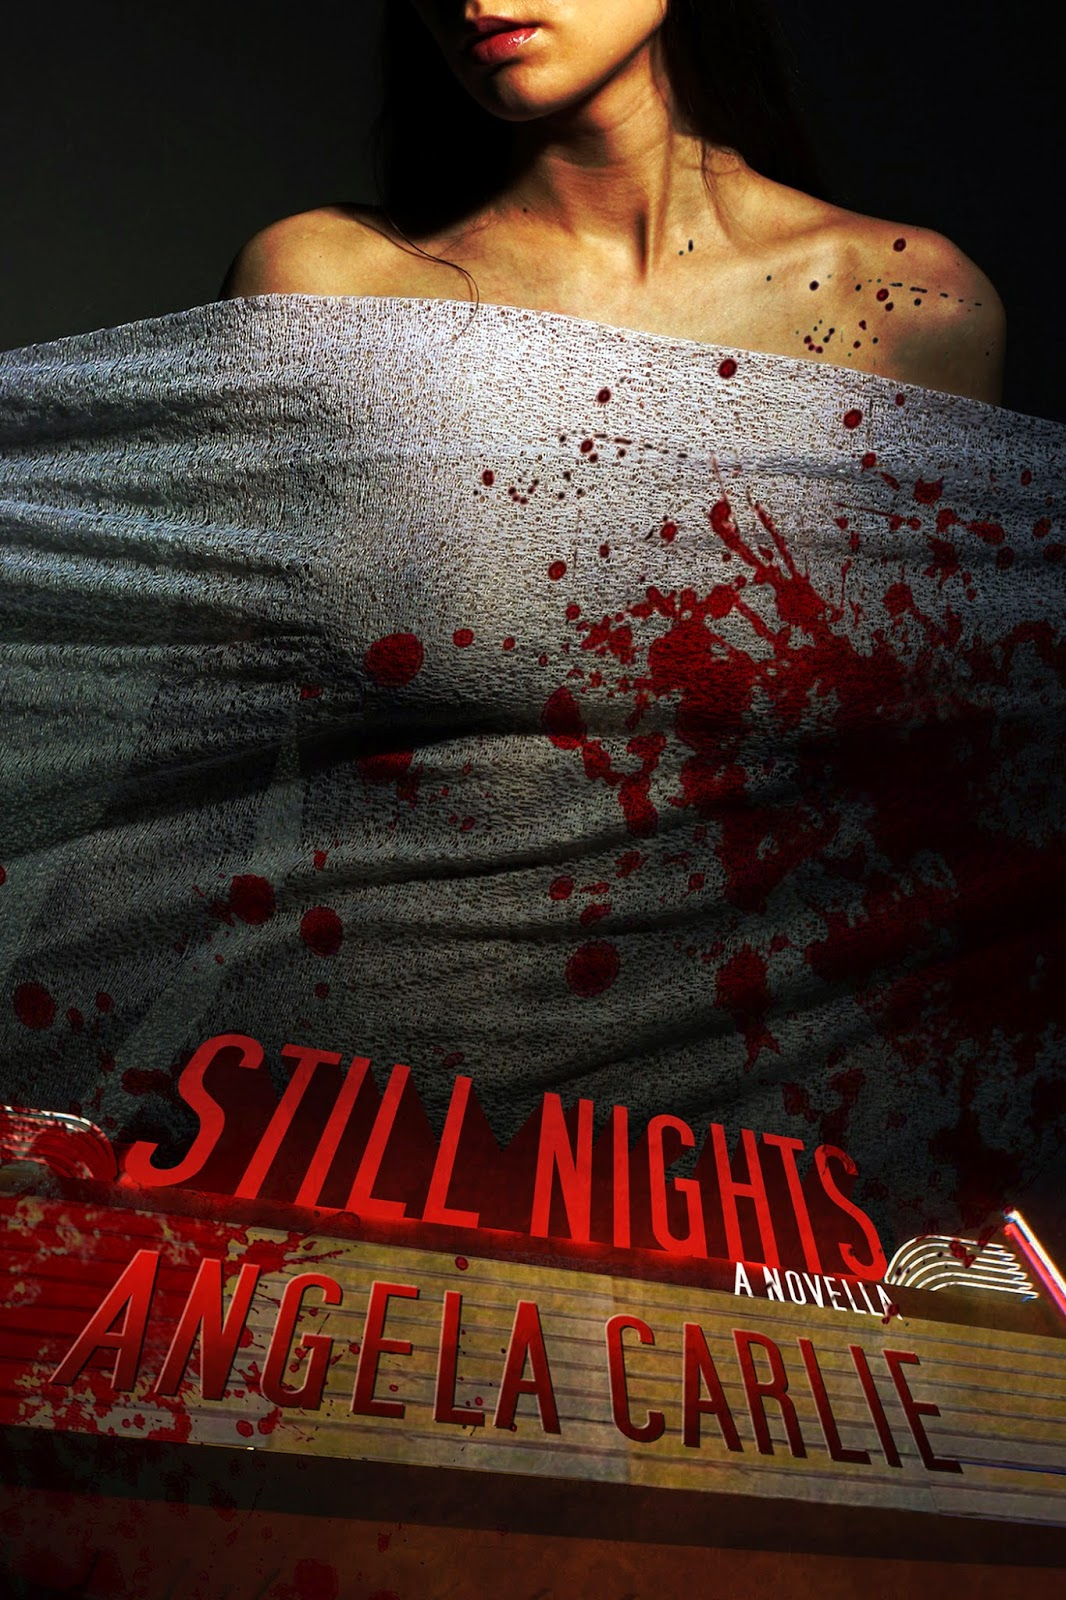 http://www.amazon.com/Still-Nights-Velvet-Black-Stories-ebook/dp/B00HKZVDVS/ref=pd_sim_kstore_1?ie=UTF8&refRID=0F82VZVQMZ6TEF7GVW4H